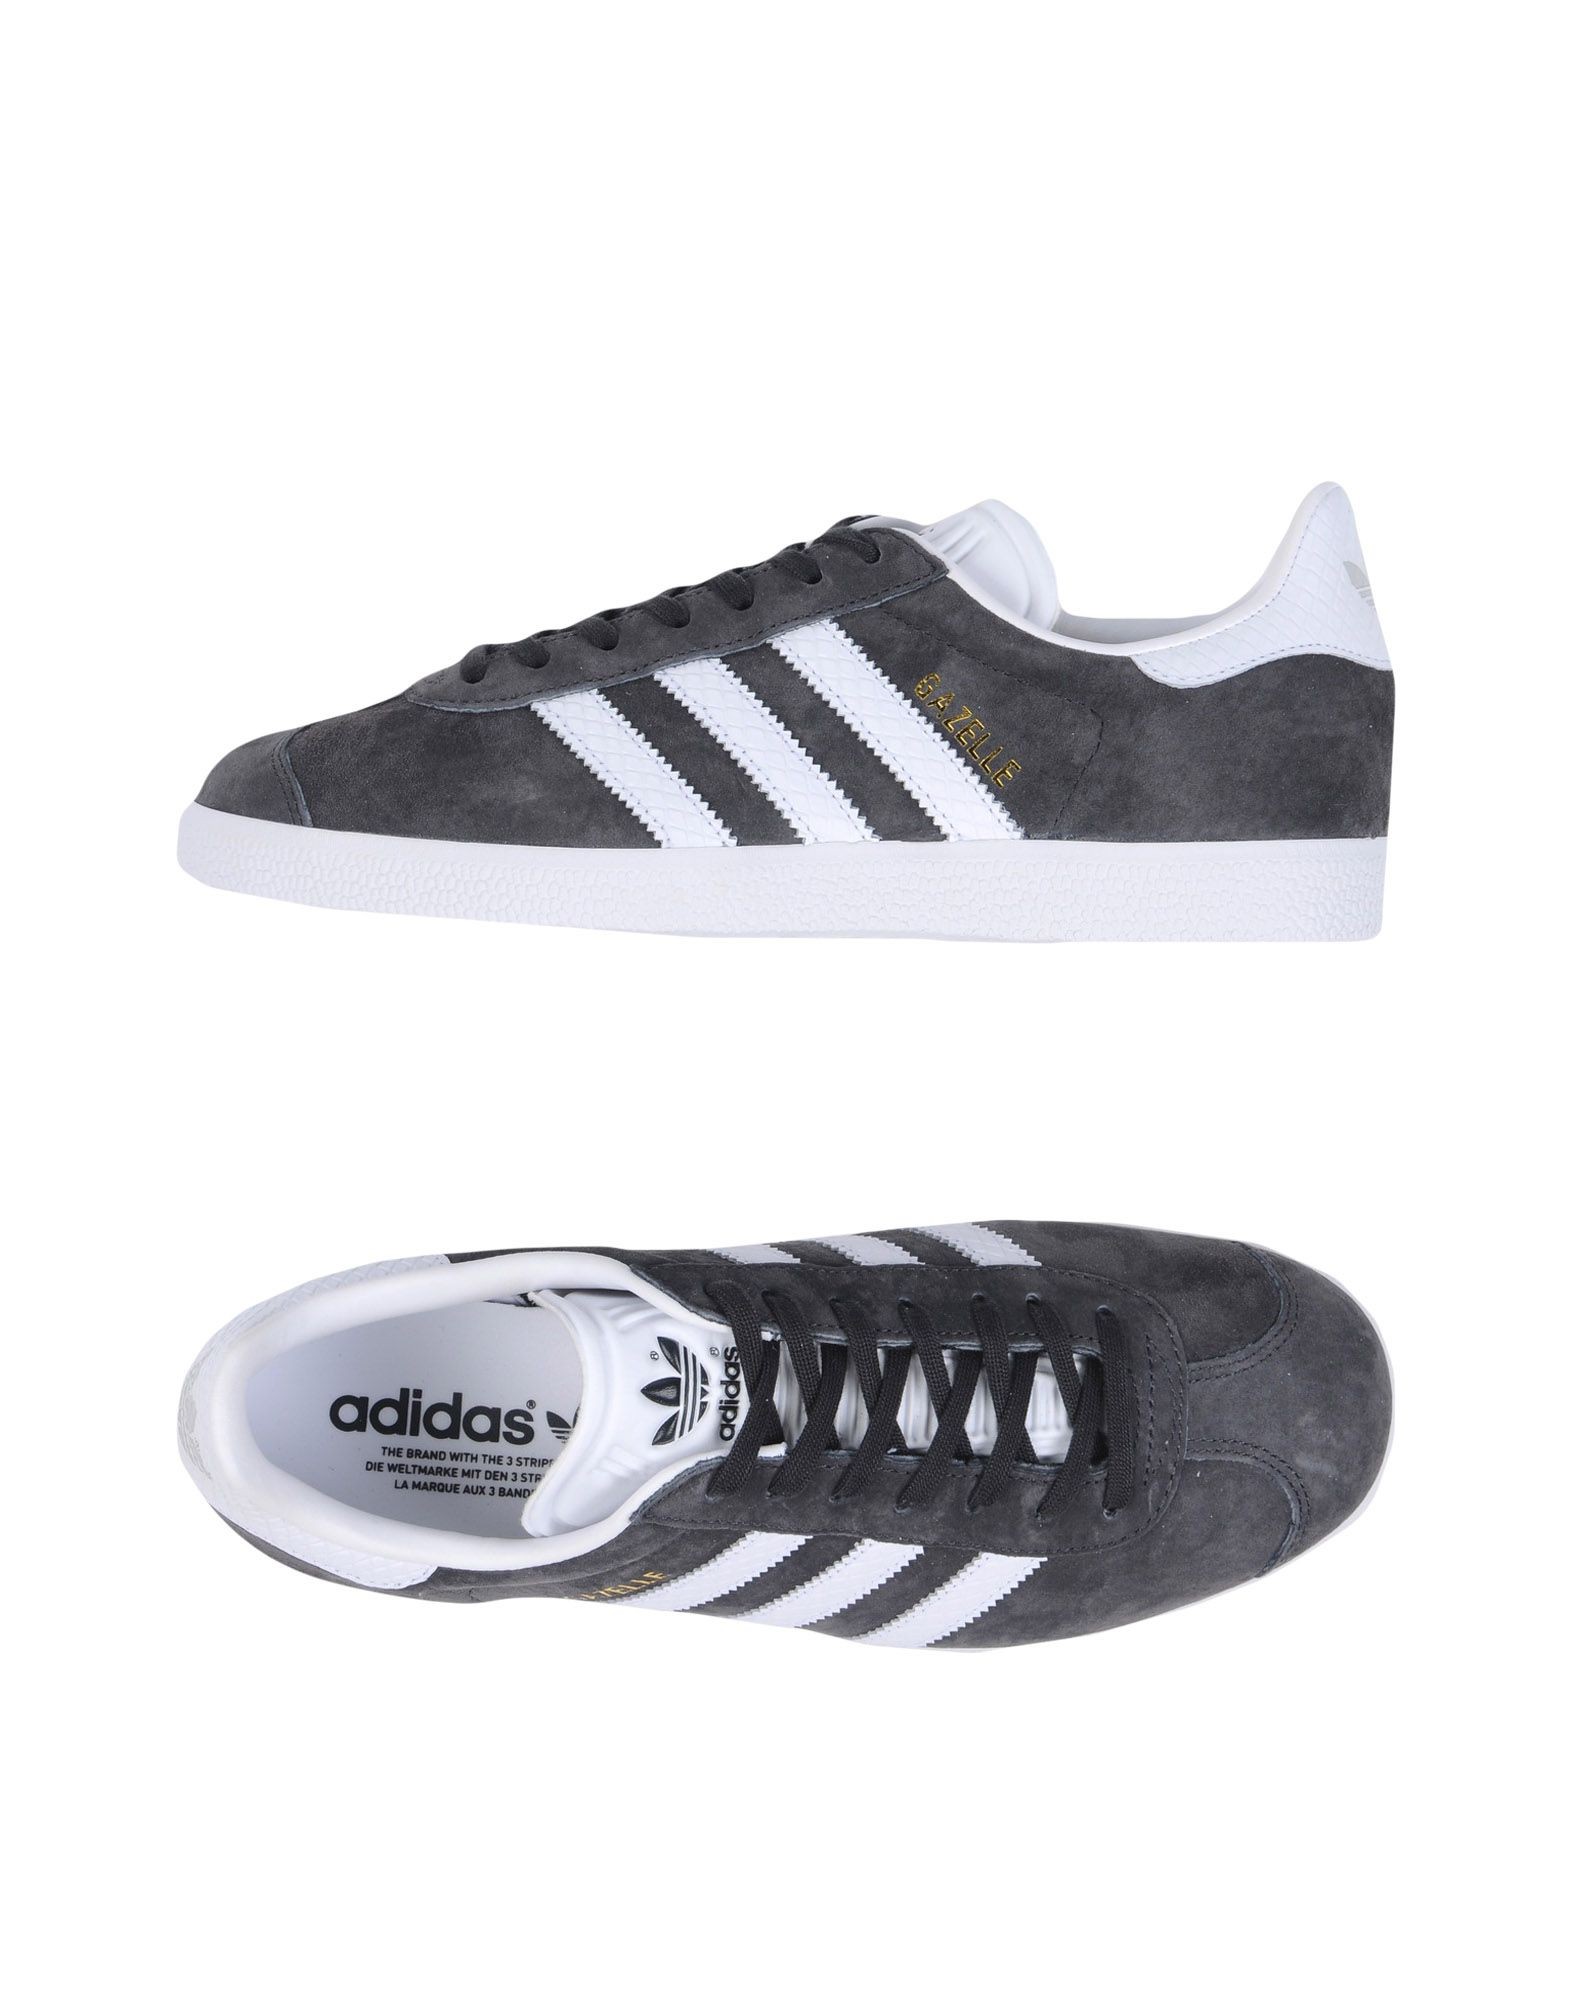 Adidas Originals Gazelle  W  Gazelle 11200038IC Gute Qualität beliebte Schuhe e927dc